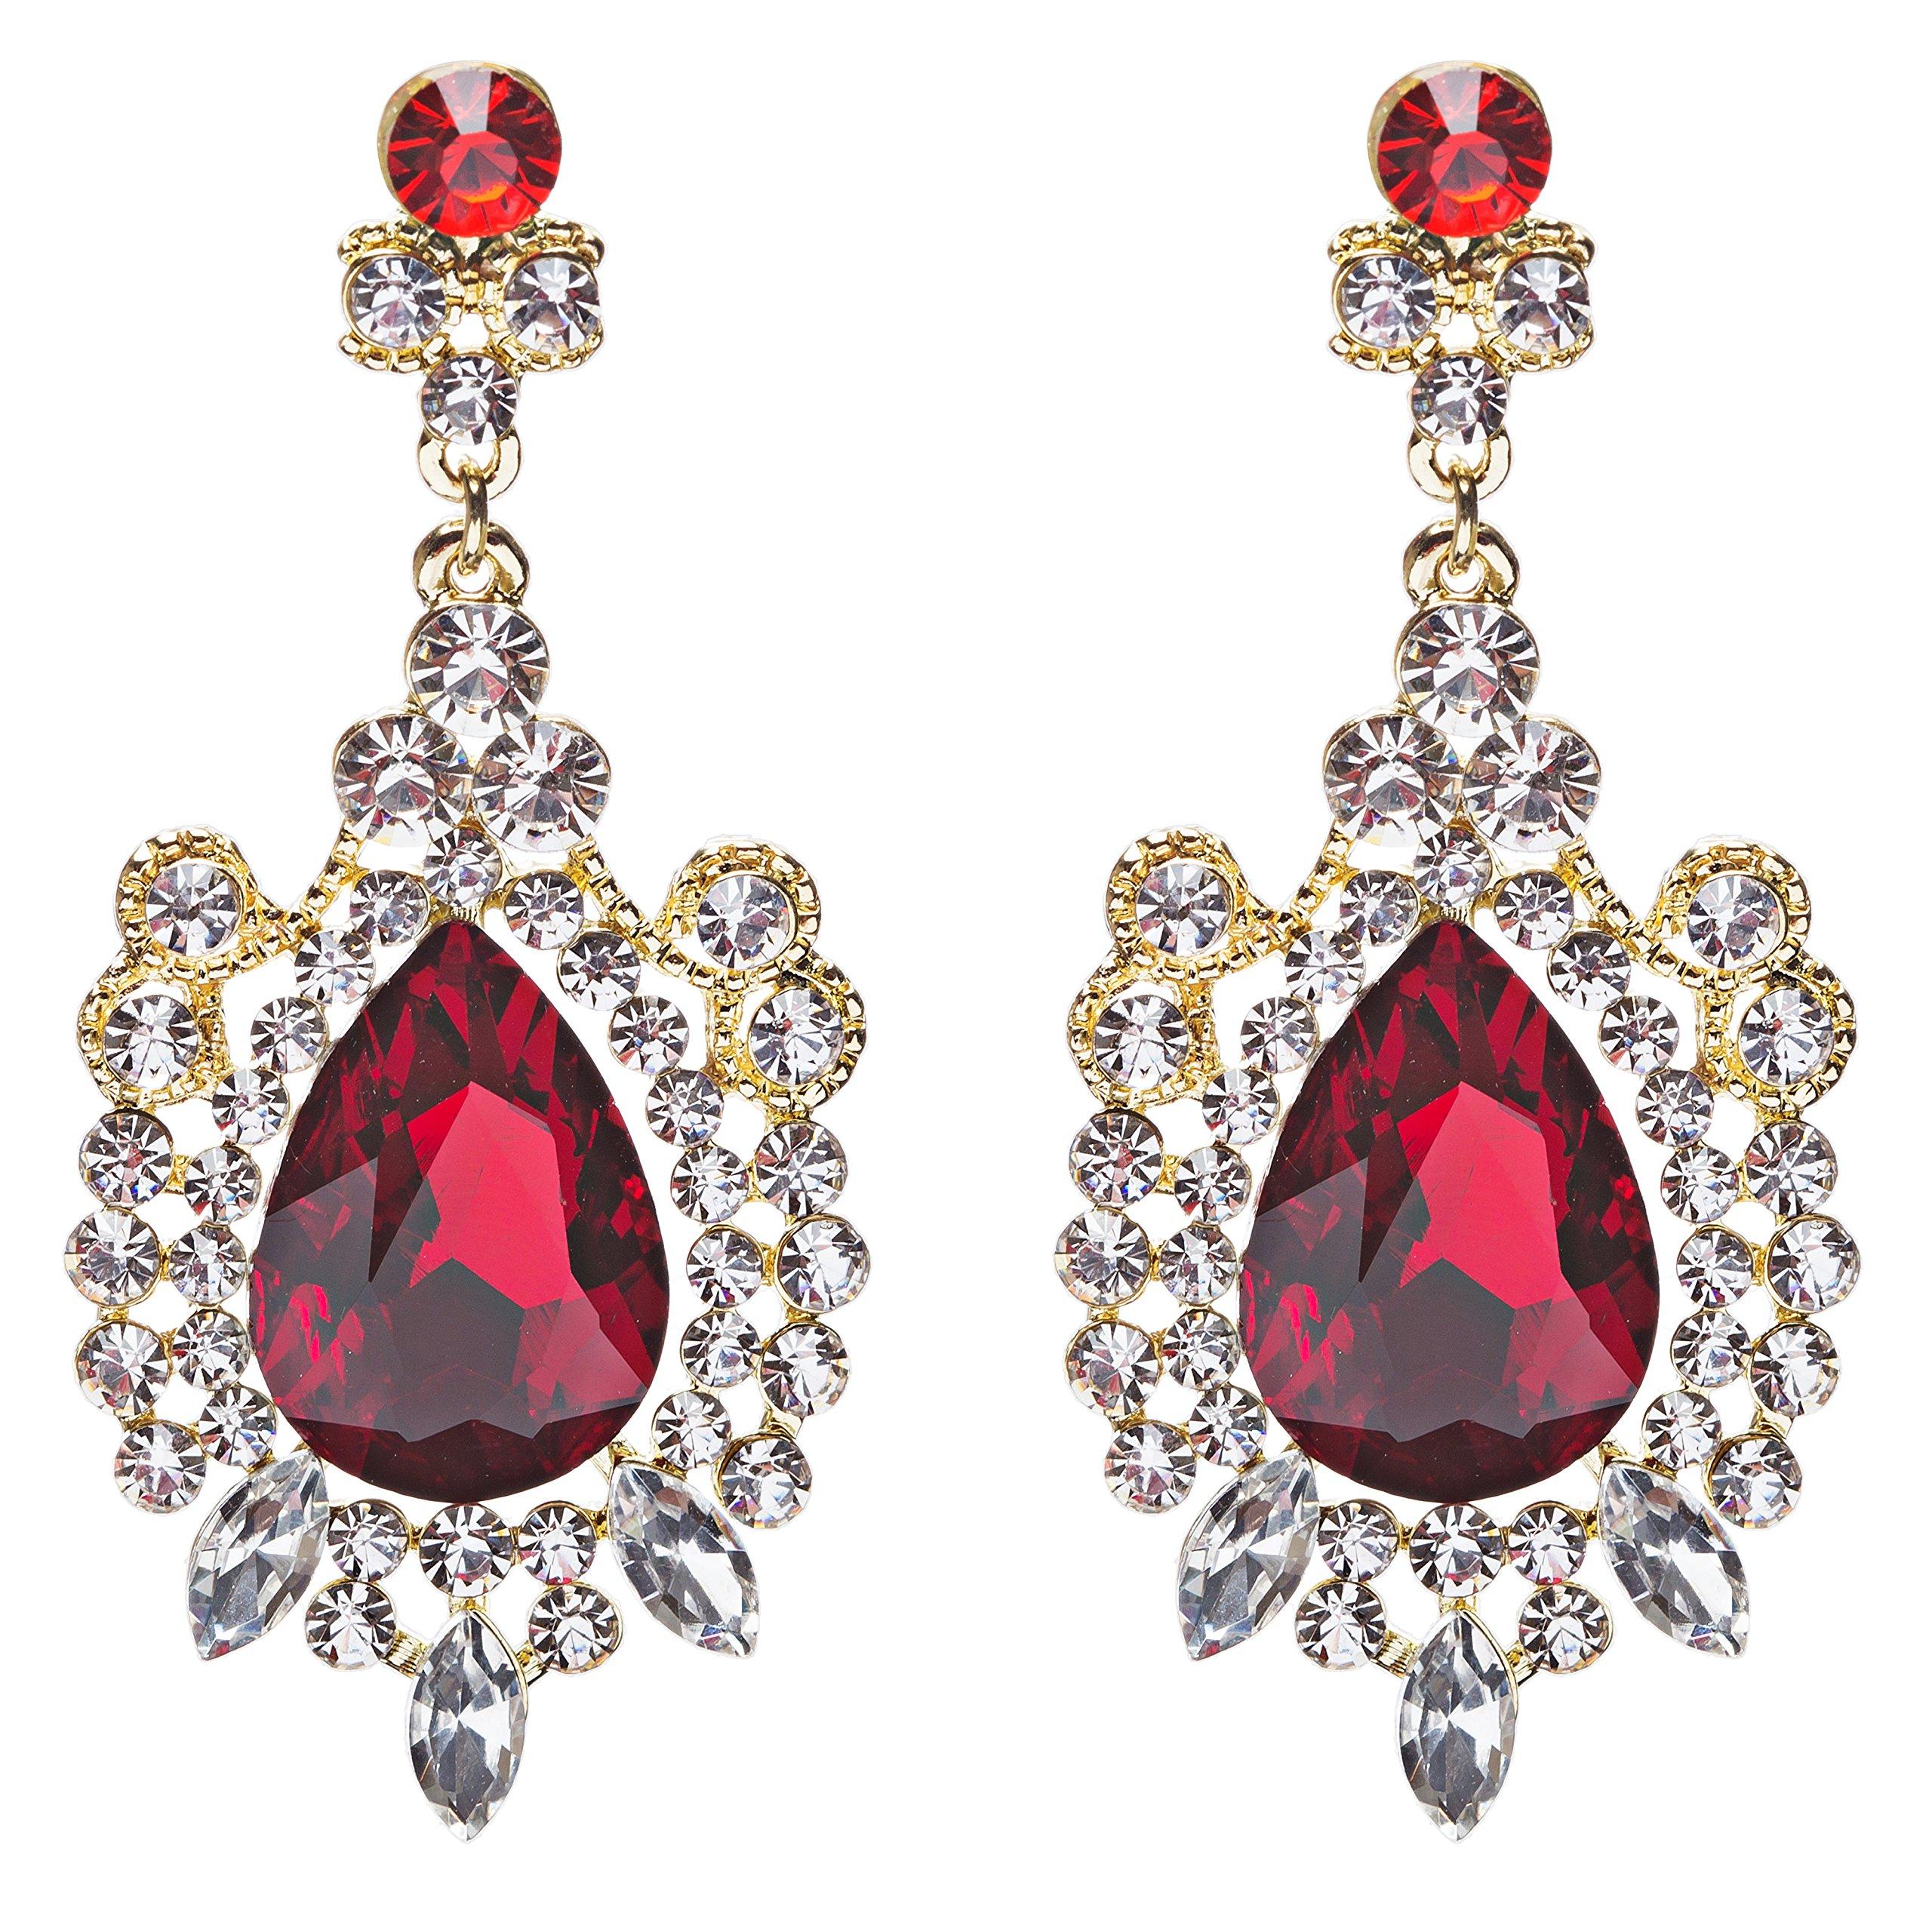 Beautiful Stunning Glamorous Crystal Rhinestone Teardrop Dangle Earrings Red